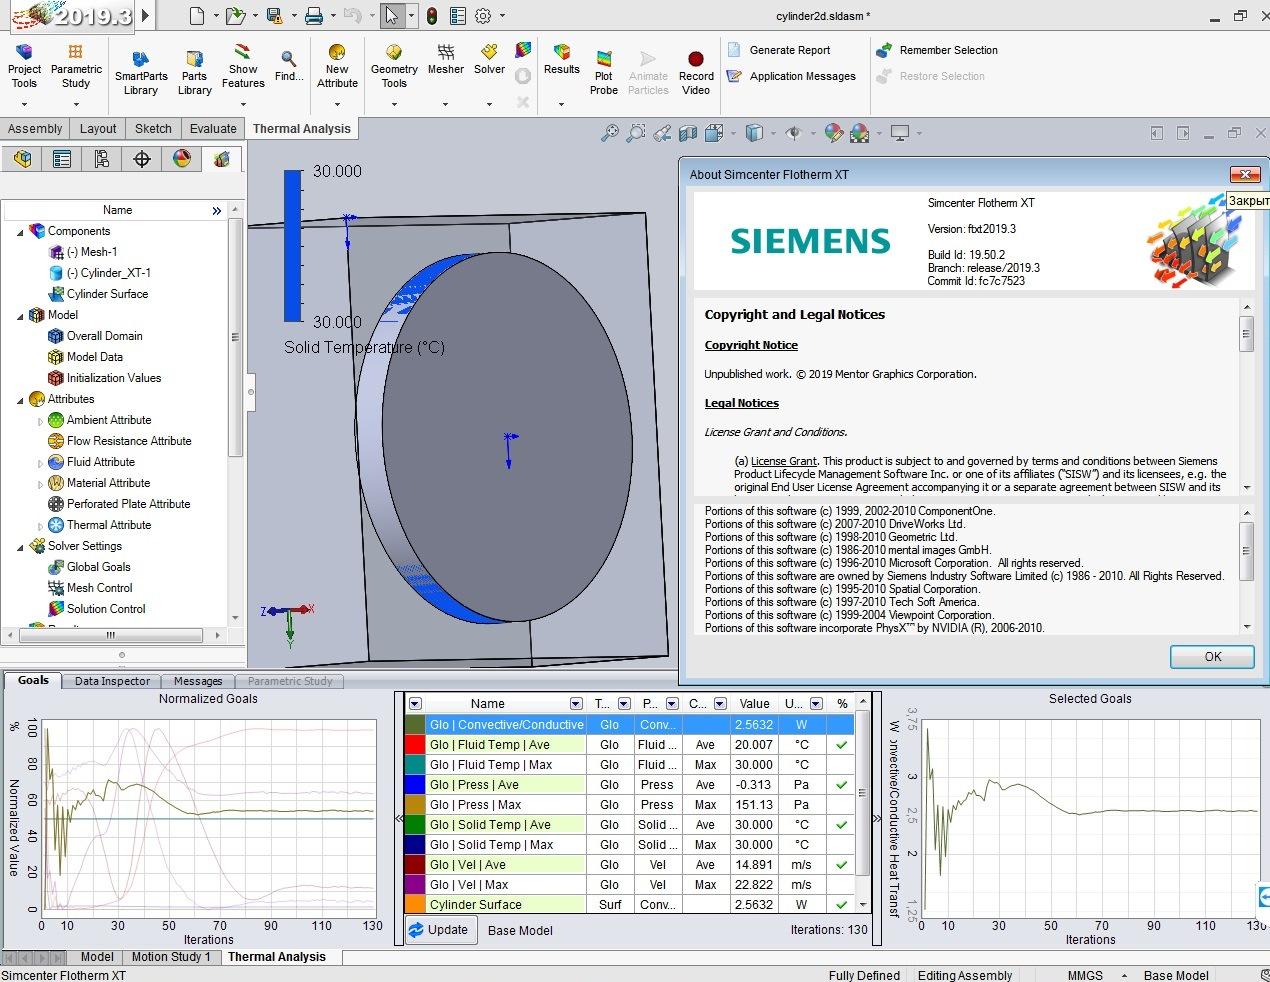 Siemens Simcenter Flotherm XT 2019.3 x64 full license